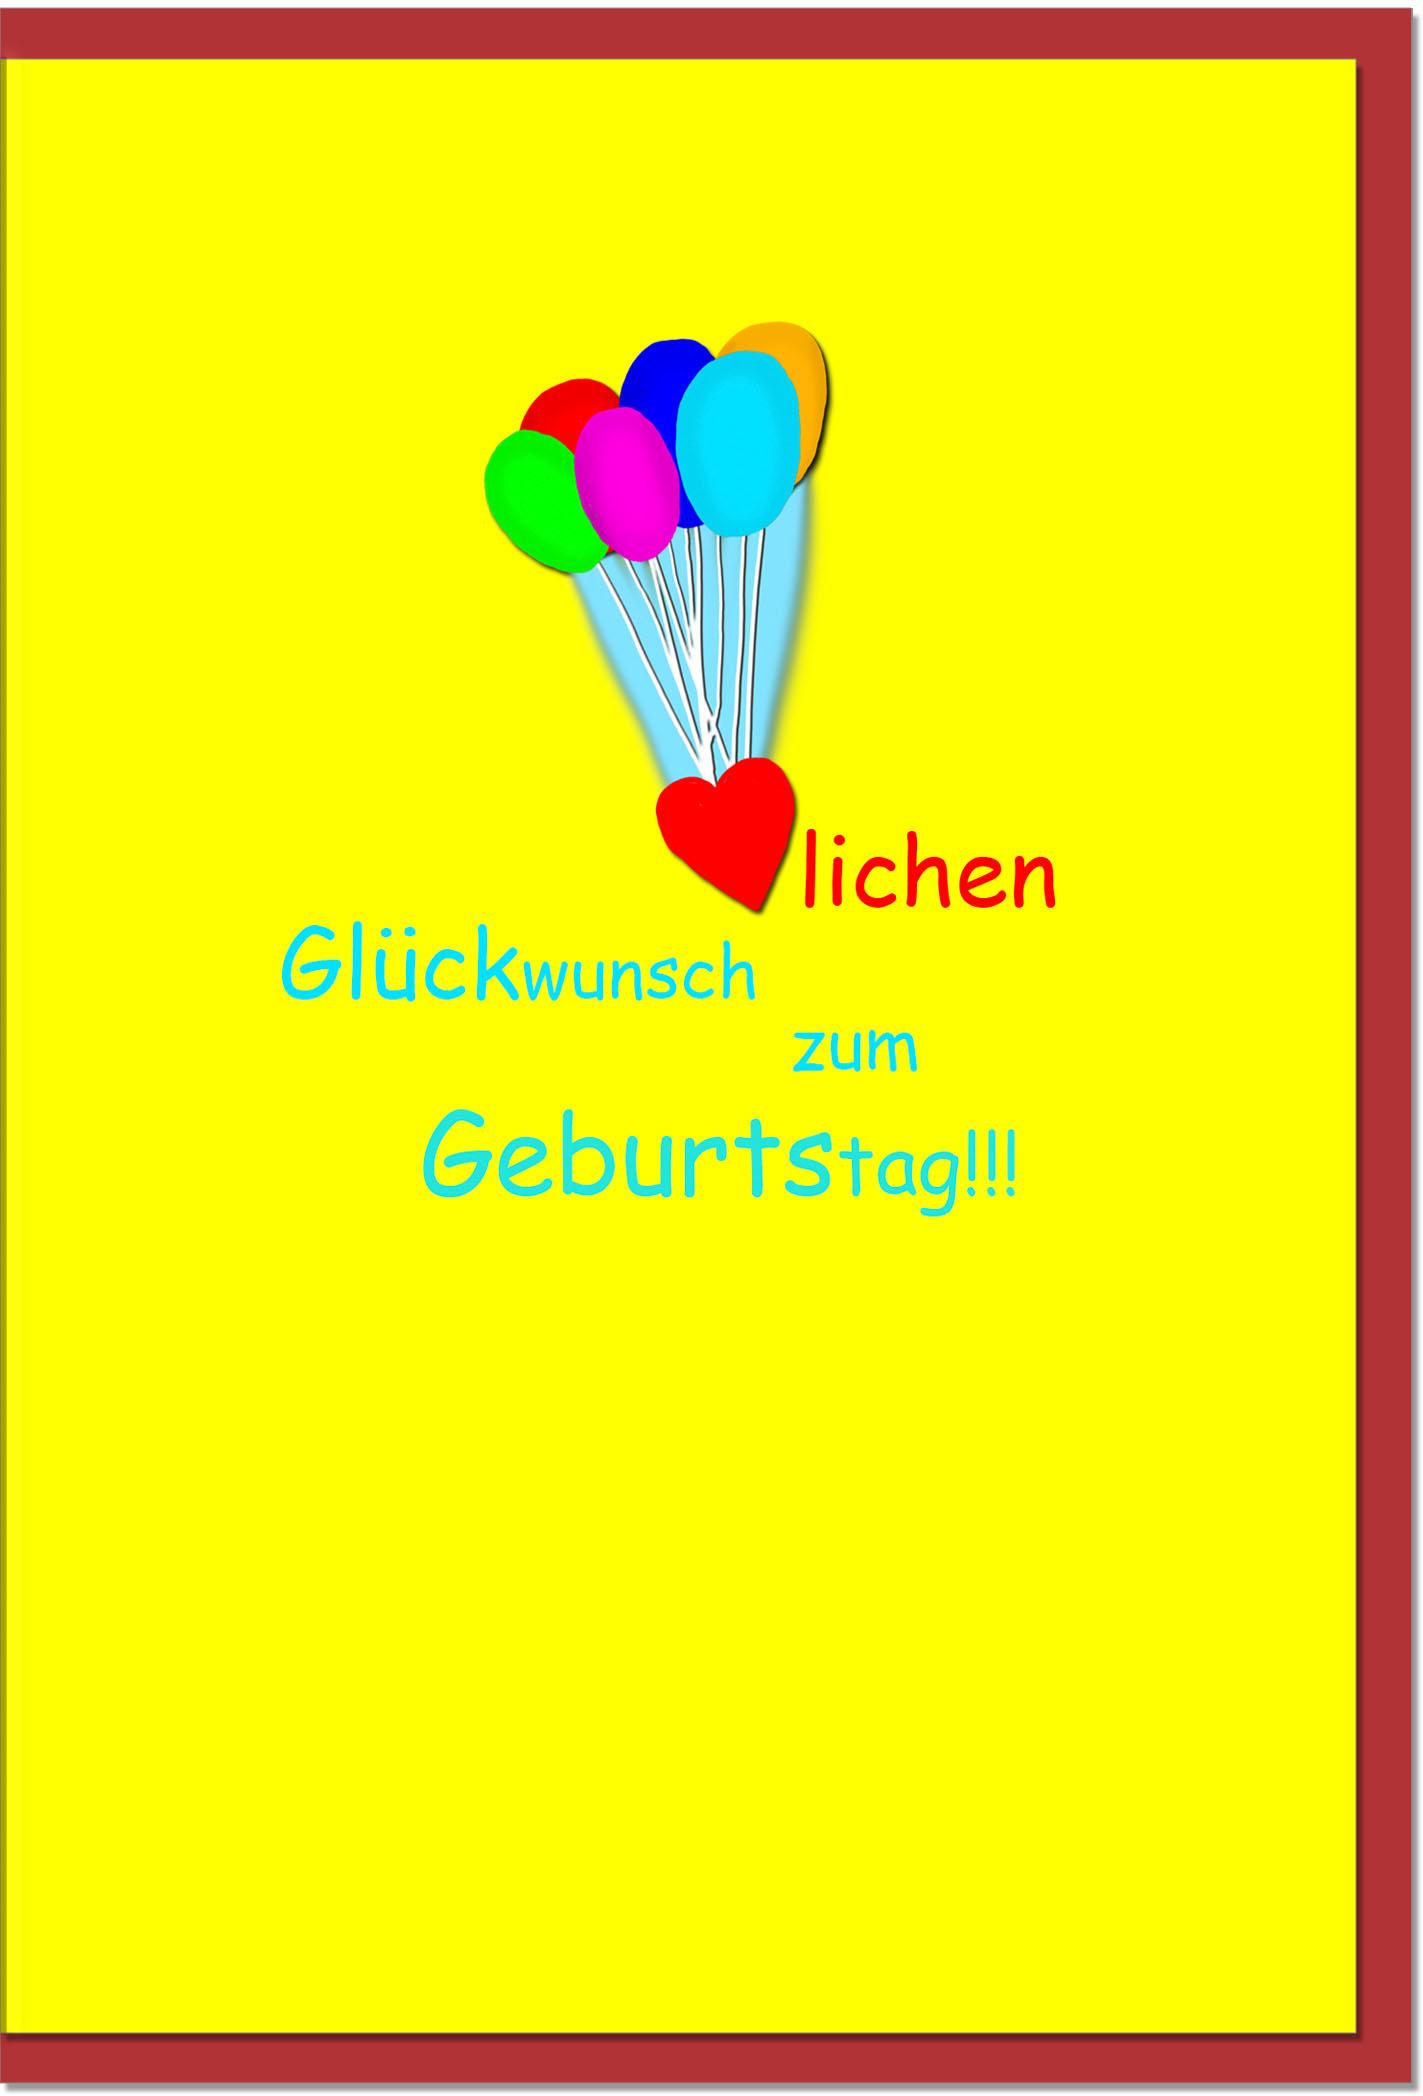 Geburtstagskarten / Grußkarten /Geburtstag Luftballons